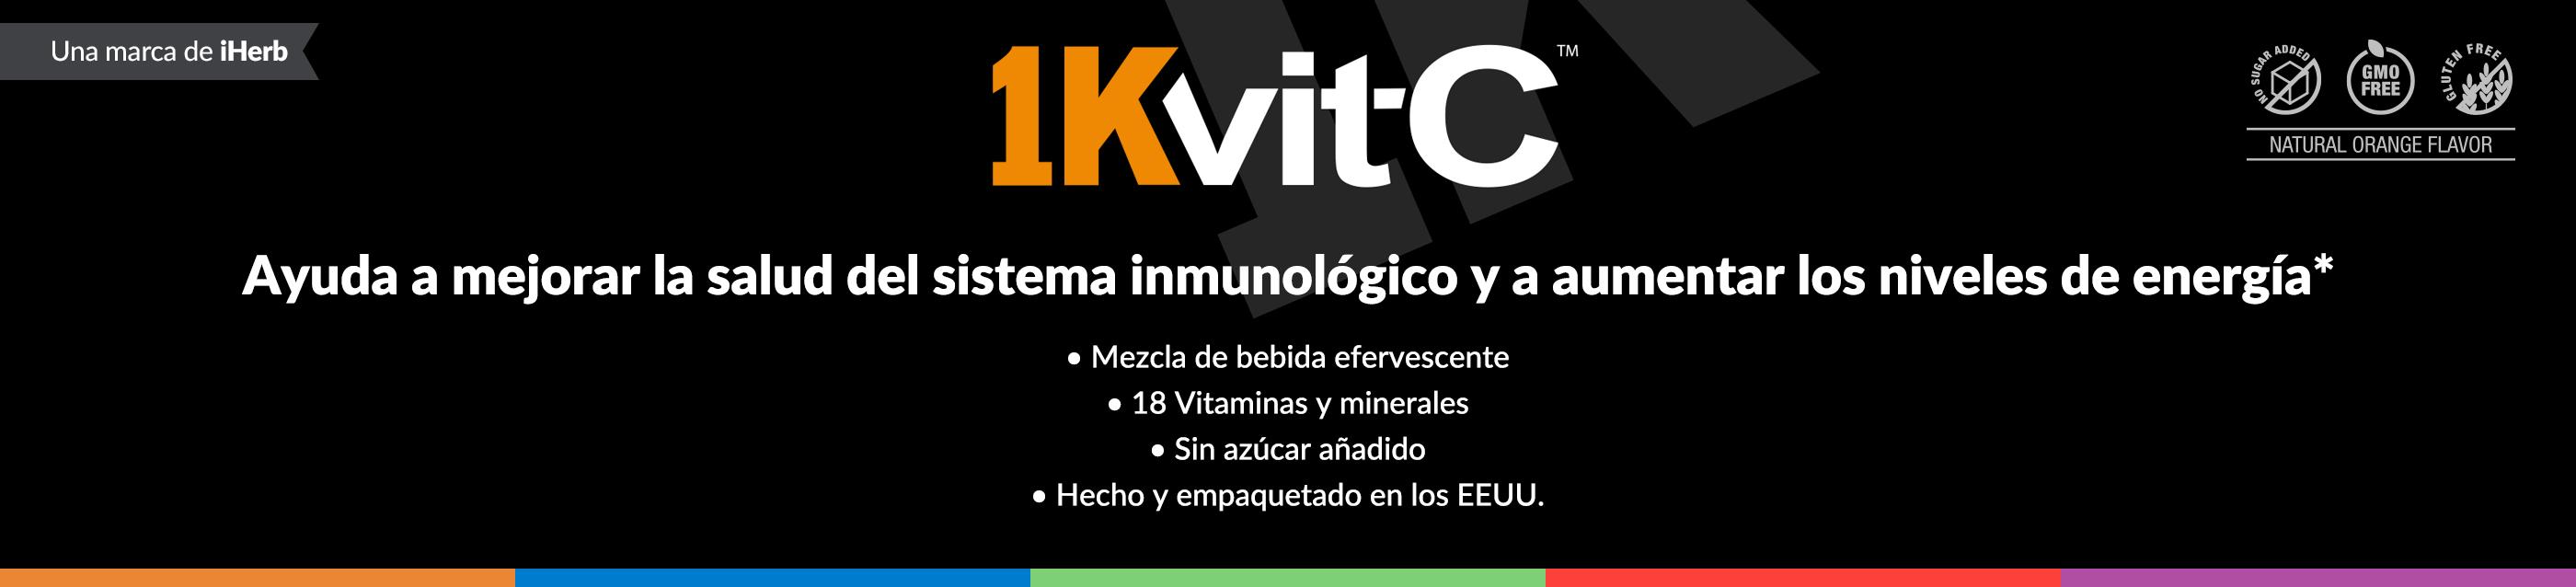 ¡1Kvit-C!